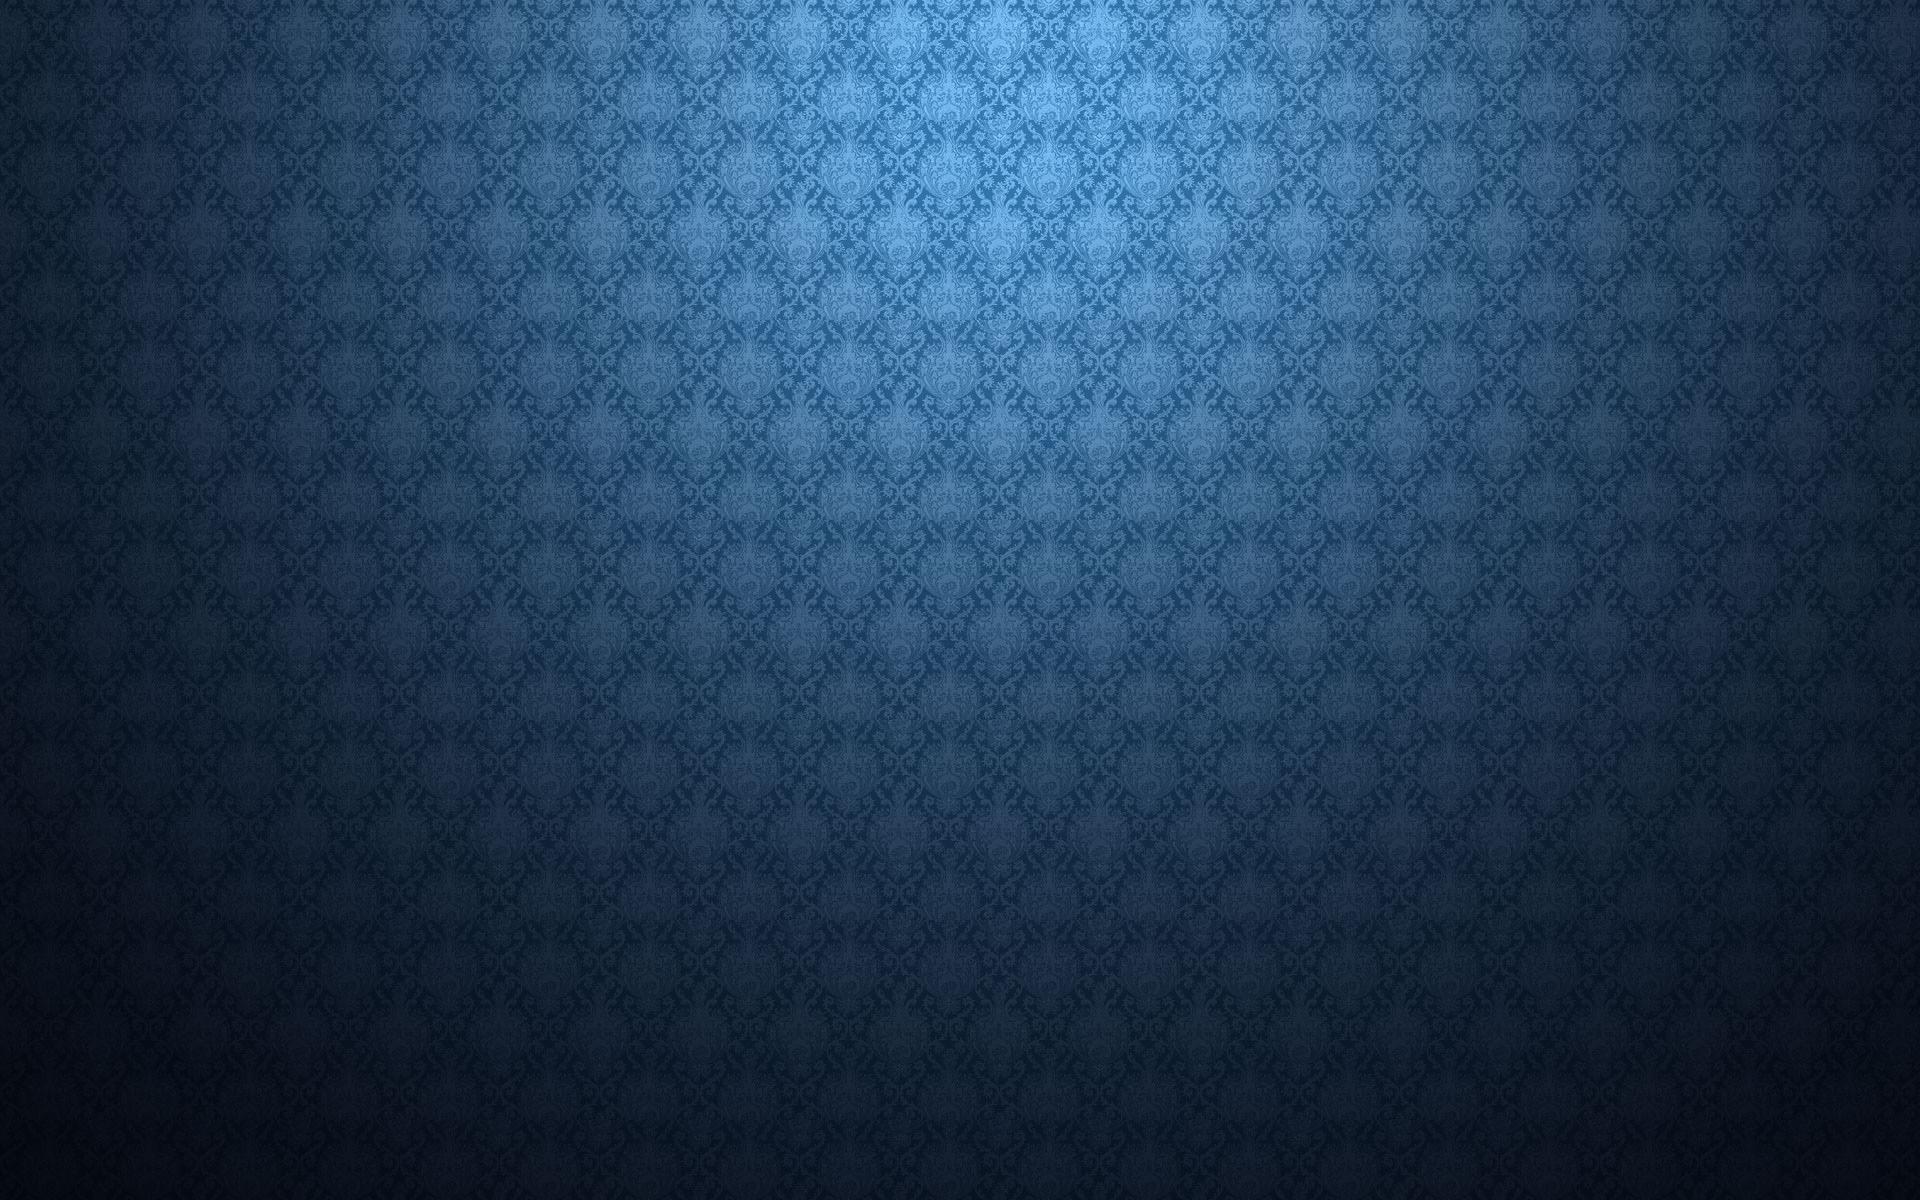 regal blue best background full hd1920x1080p, 1280x720p, - hd